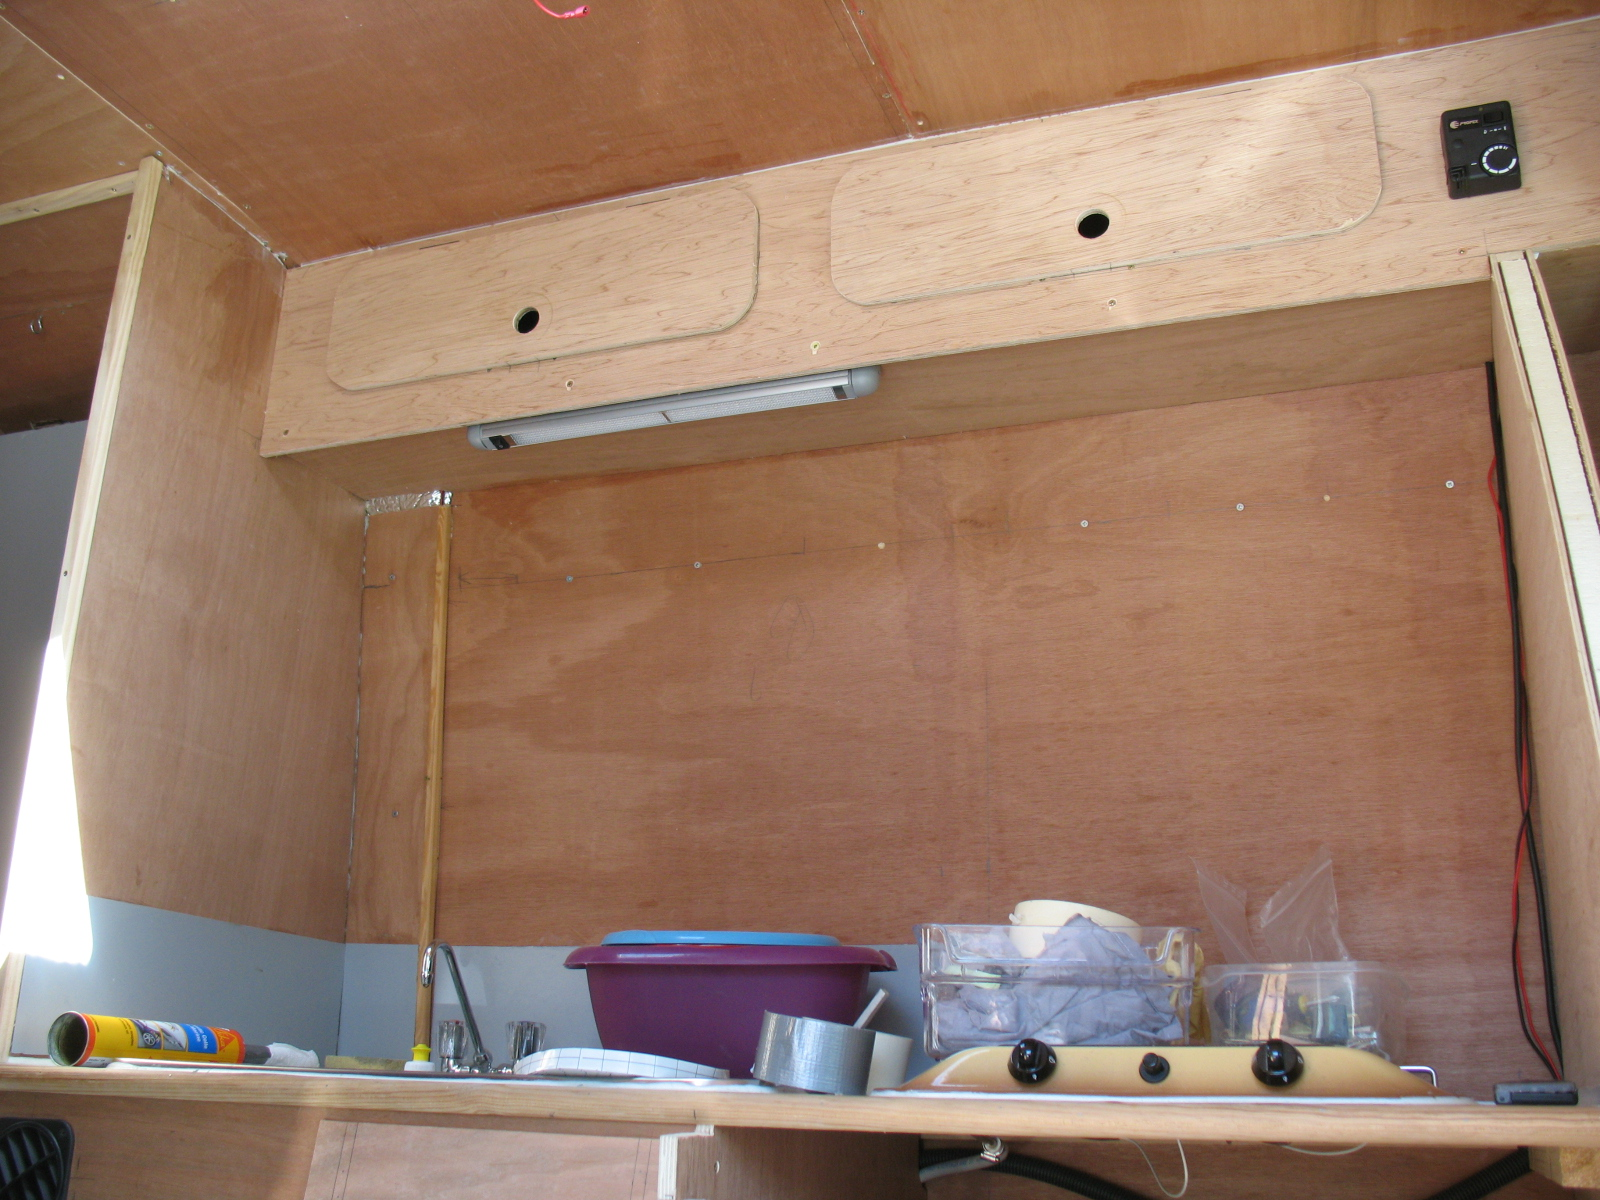 Le fourgon am nag d 39 olivier et josiane poimobile for Caravane chambre 19 meubles